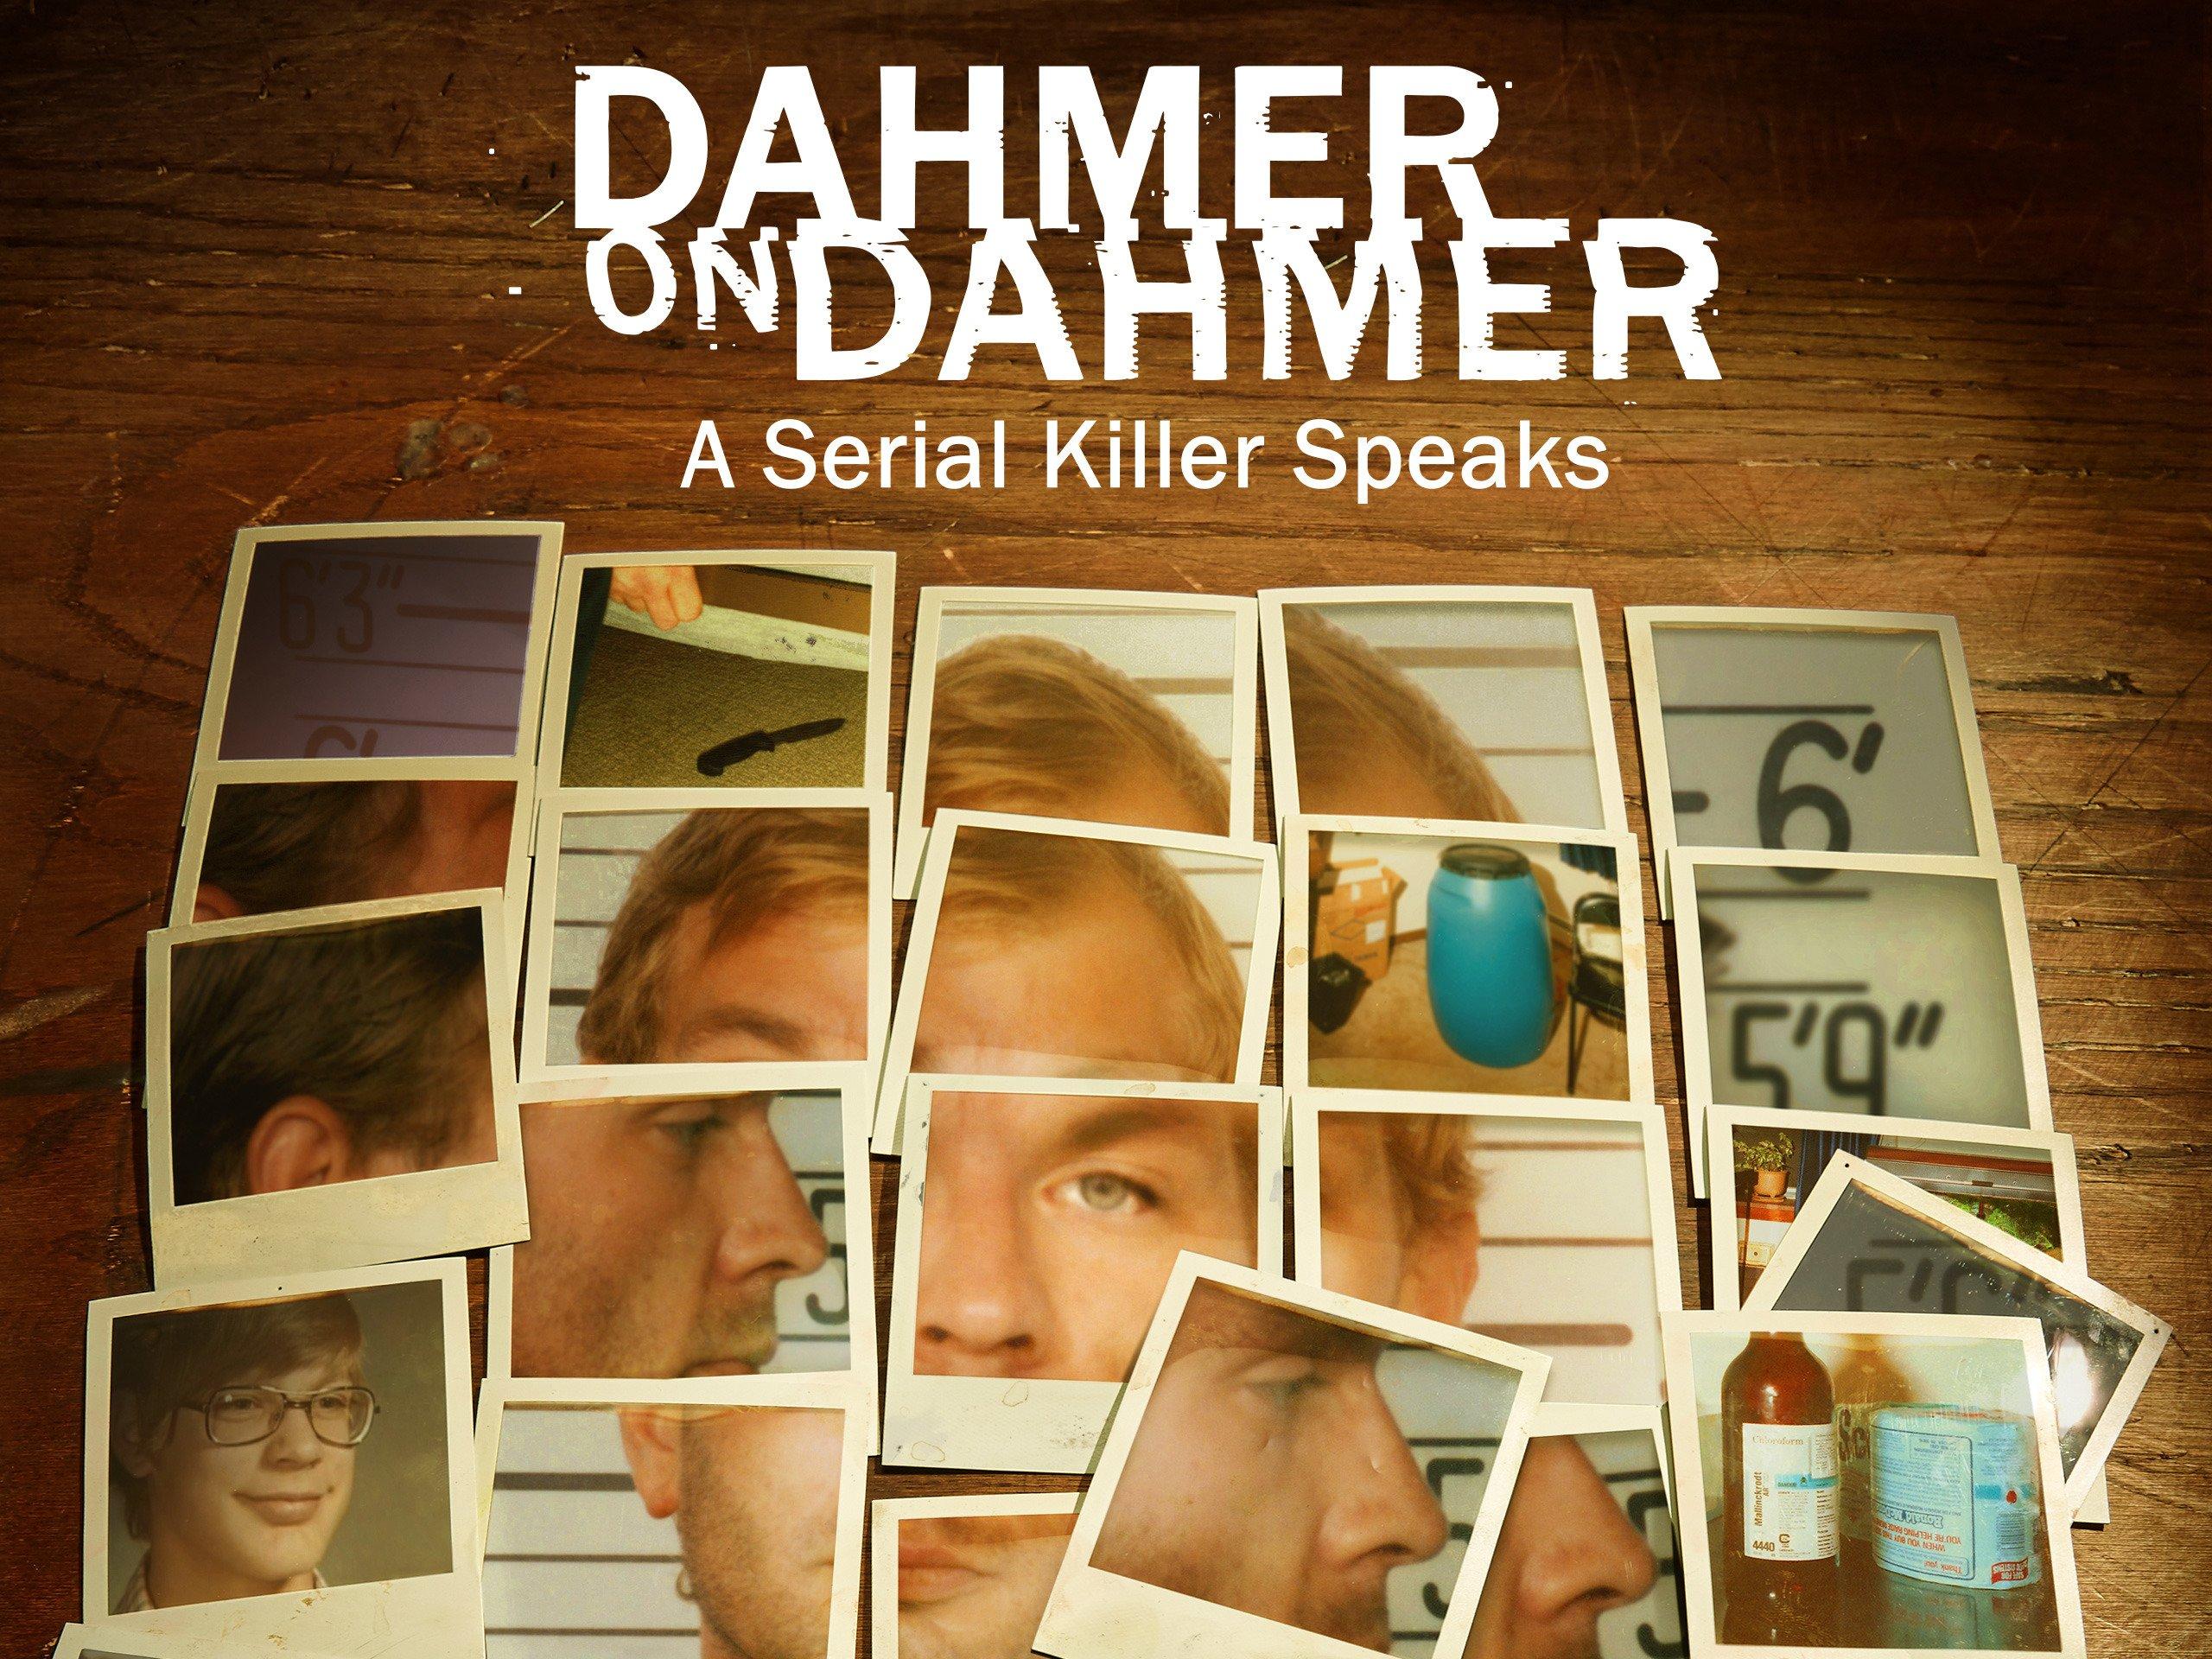 Dahmer on Dahmer: A Serial Killer Speaks - Season 1